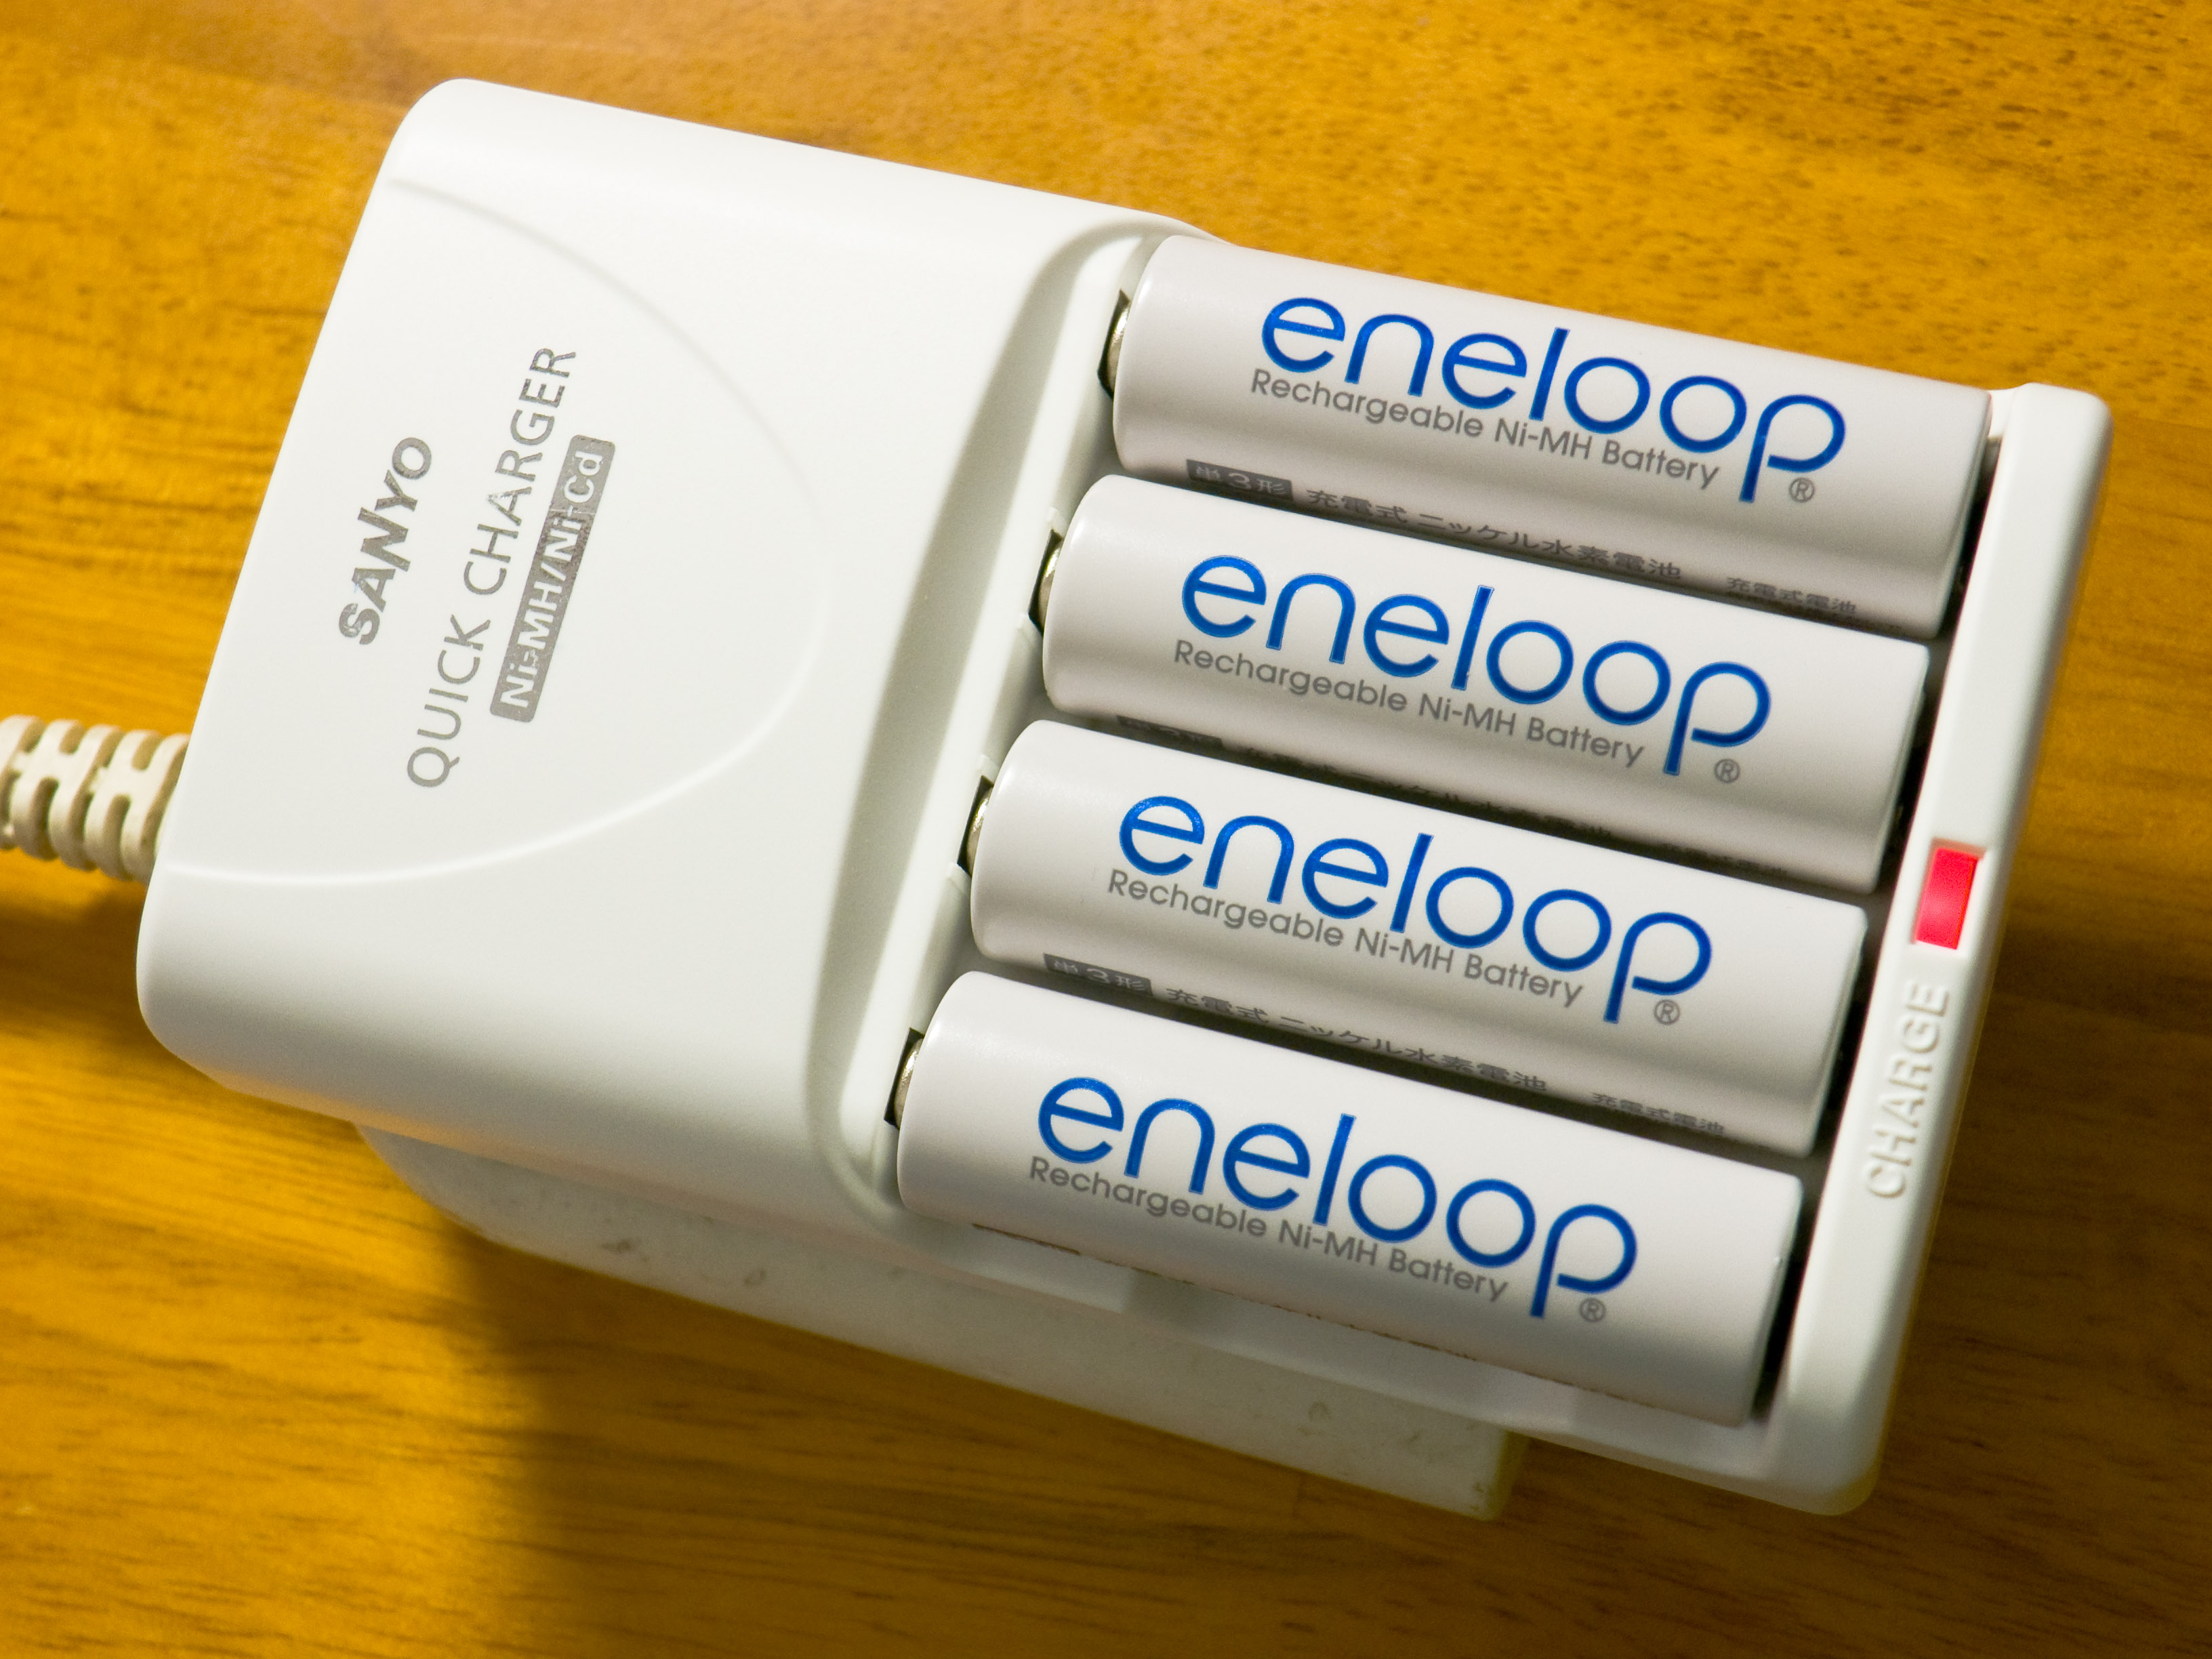 Eneloop_AA_ja_on_charger.jpg